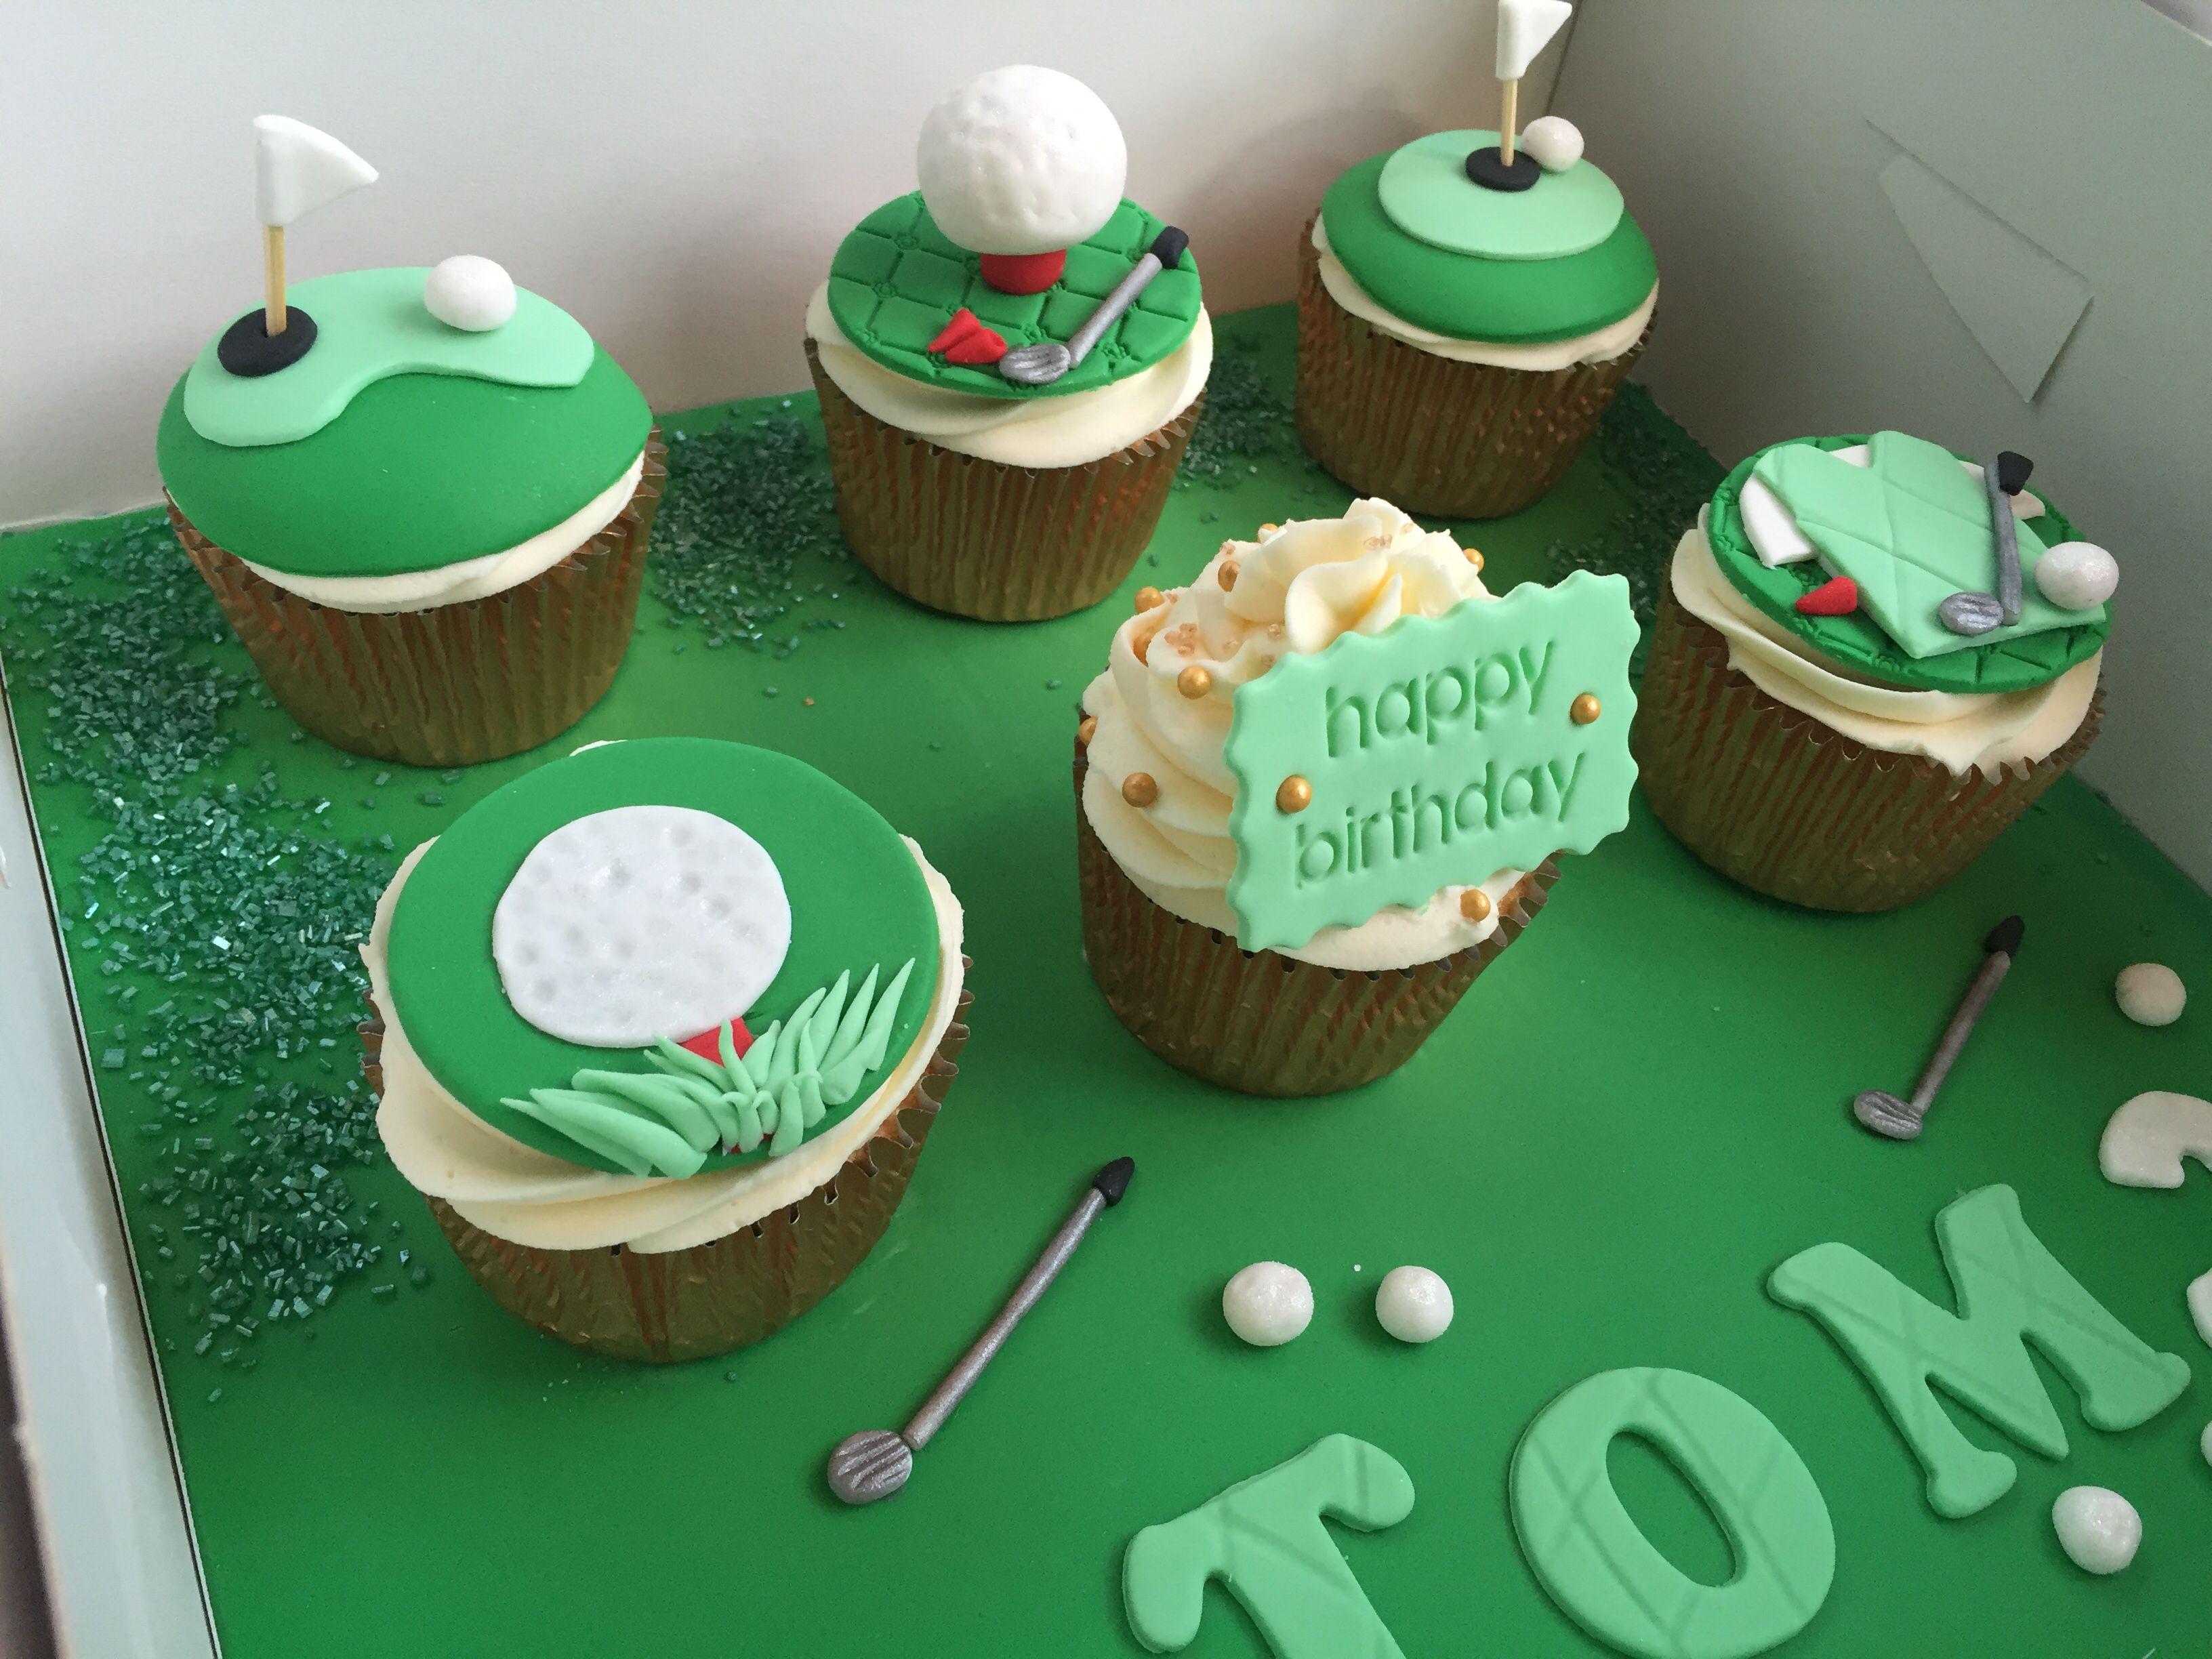 Golf cupcakes | Tasty chocolate cake, Chocolate sponge ...